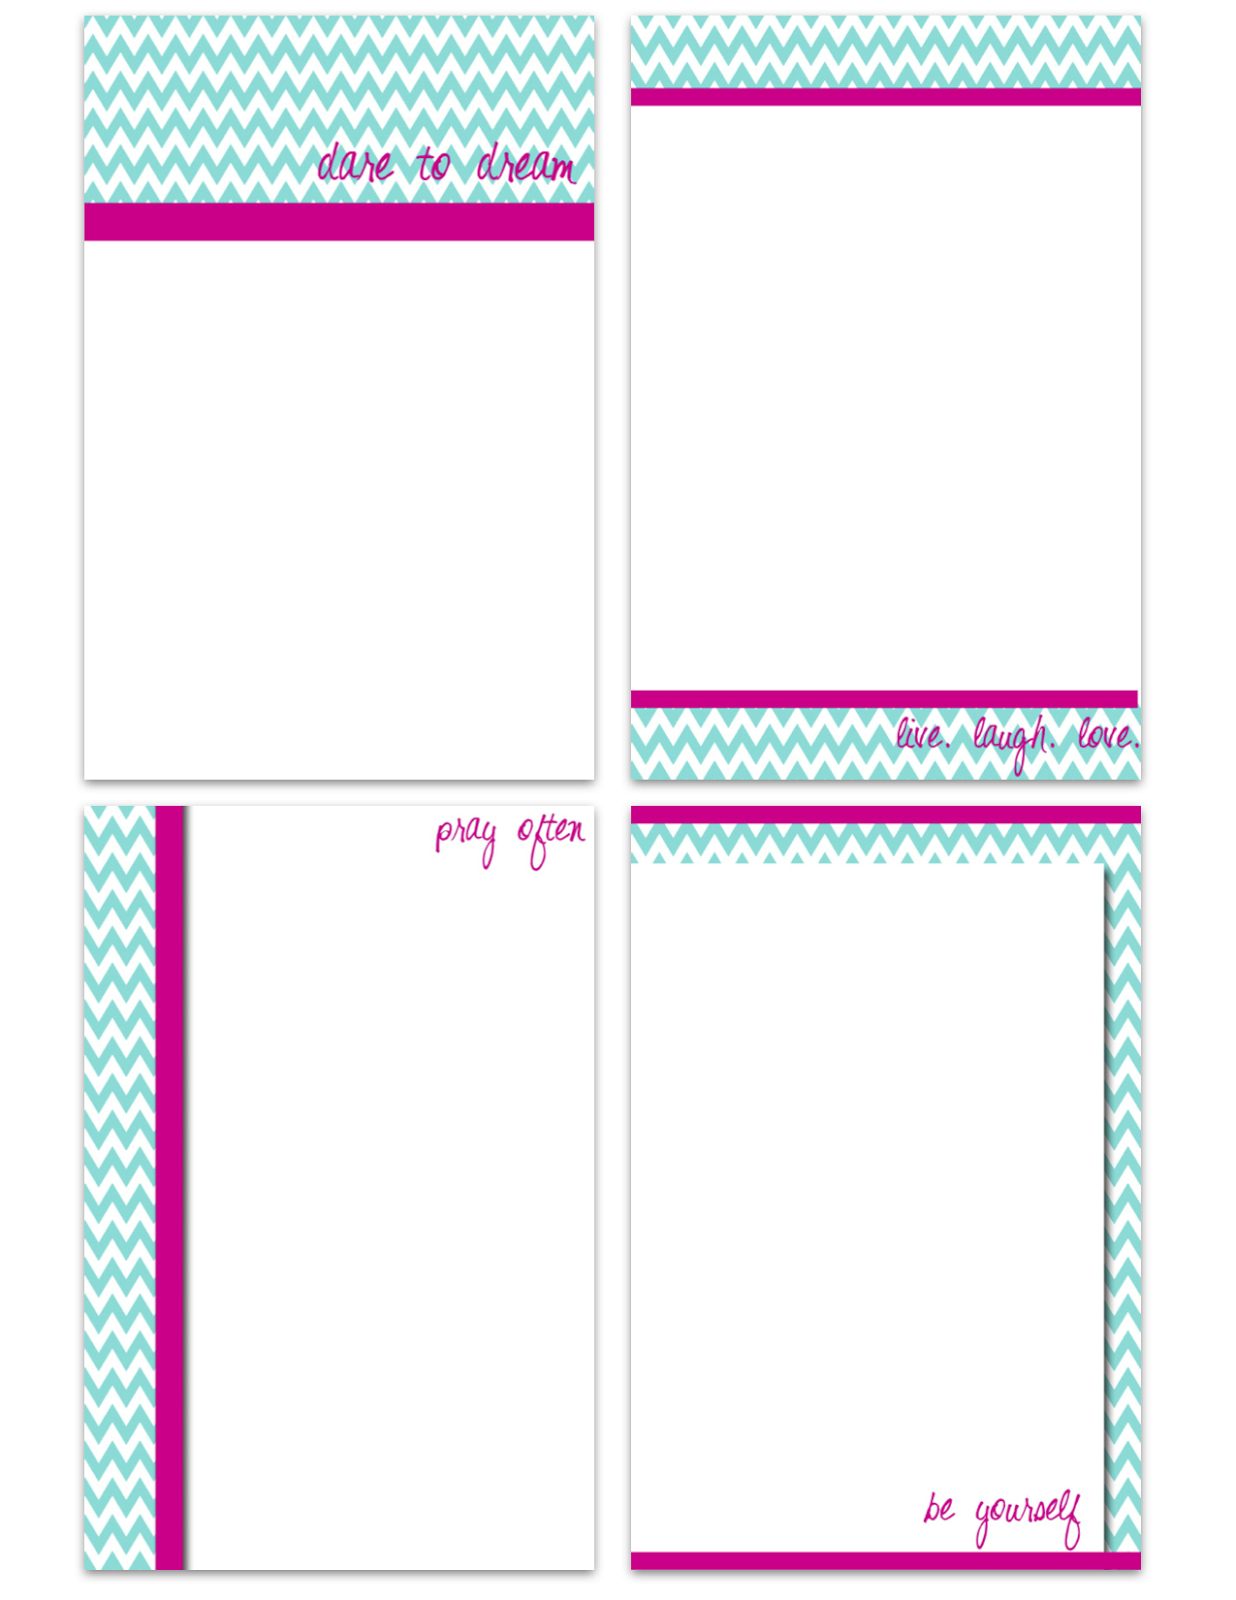 My Fashionable Designs: Free Printable Notecards: Teal Chevron - Free Printable Note Cards